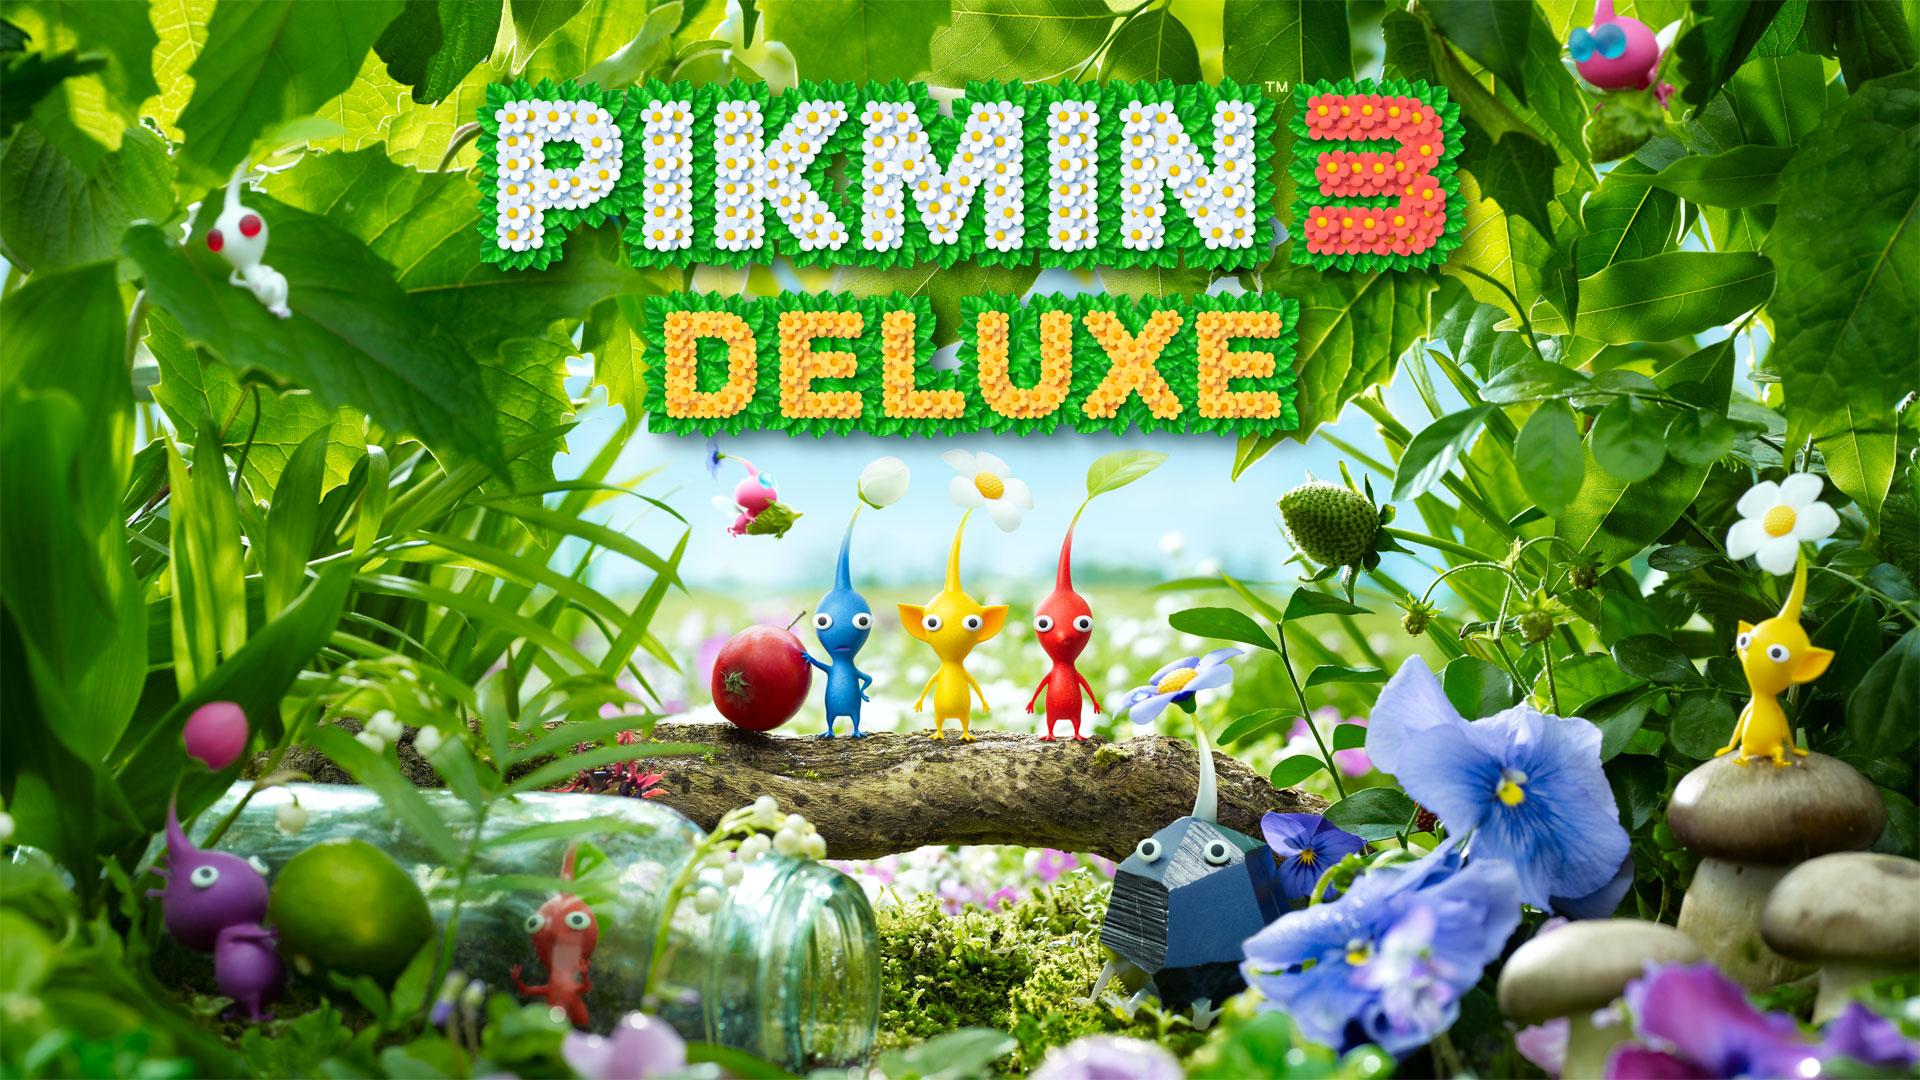 Pikmin 3 Deluxe a caminho da Nintendo Switch